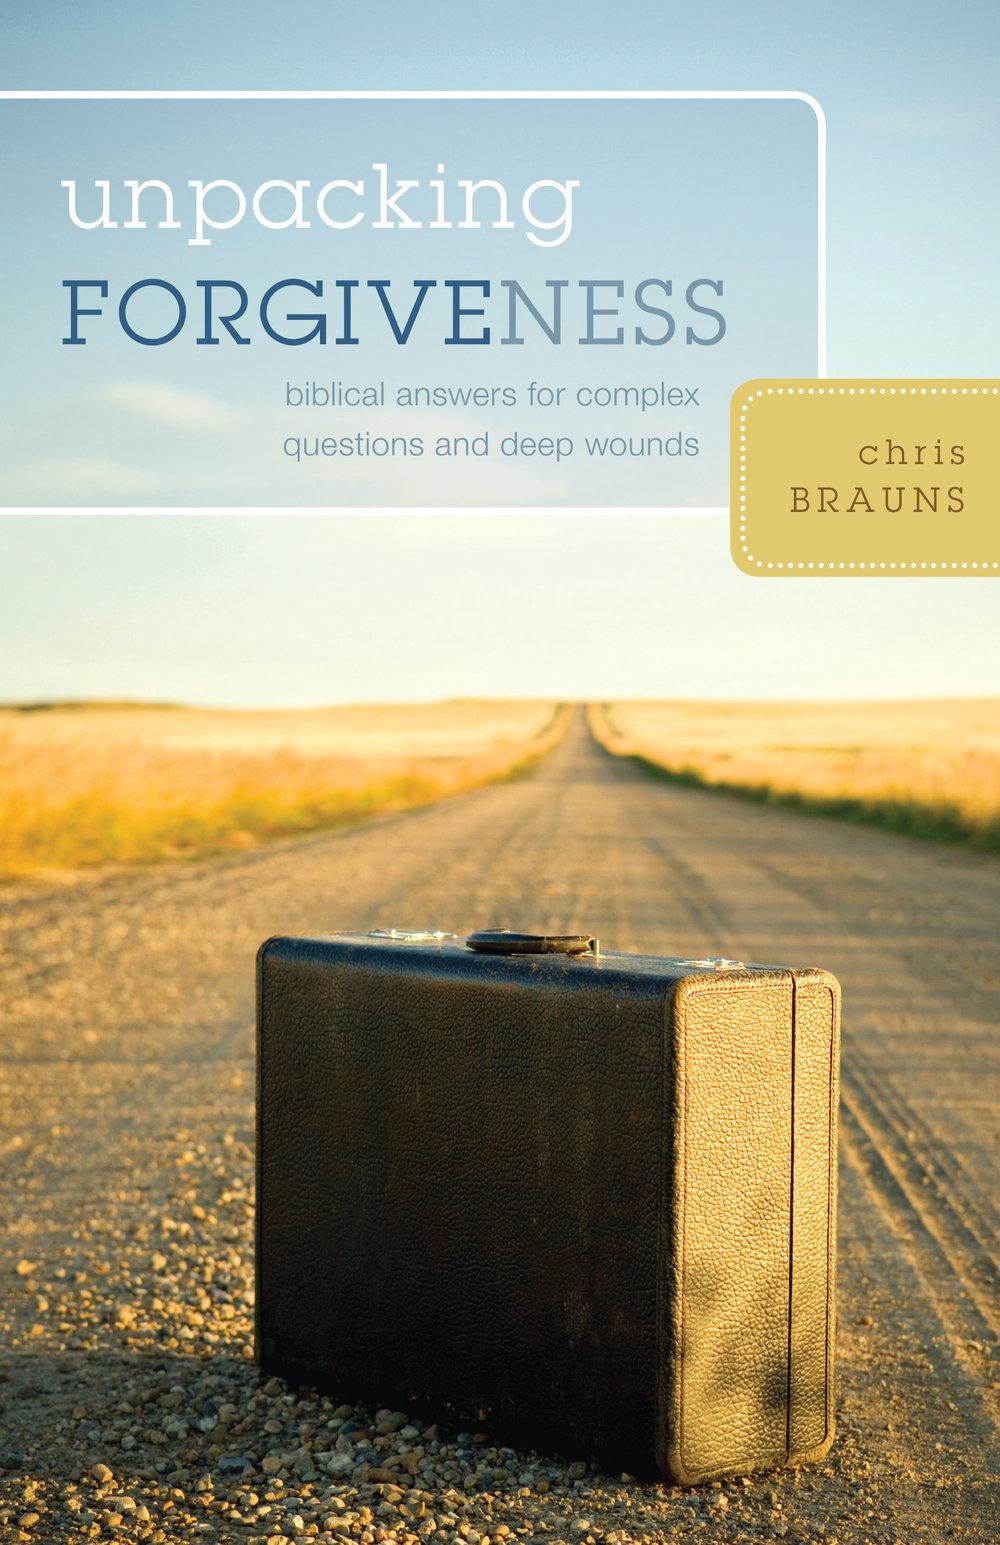 Unpacking Forgiveness - Chris Brauns